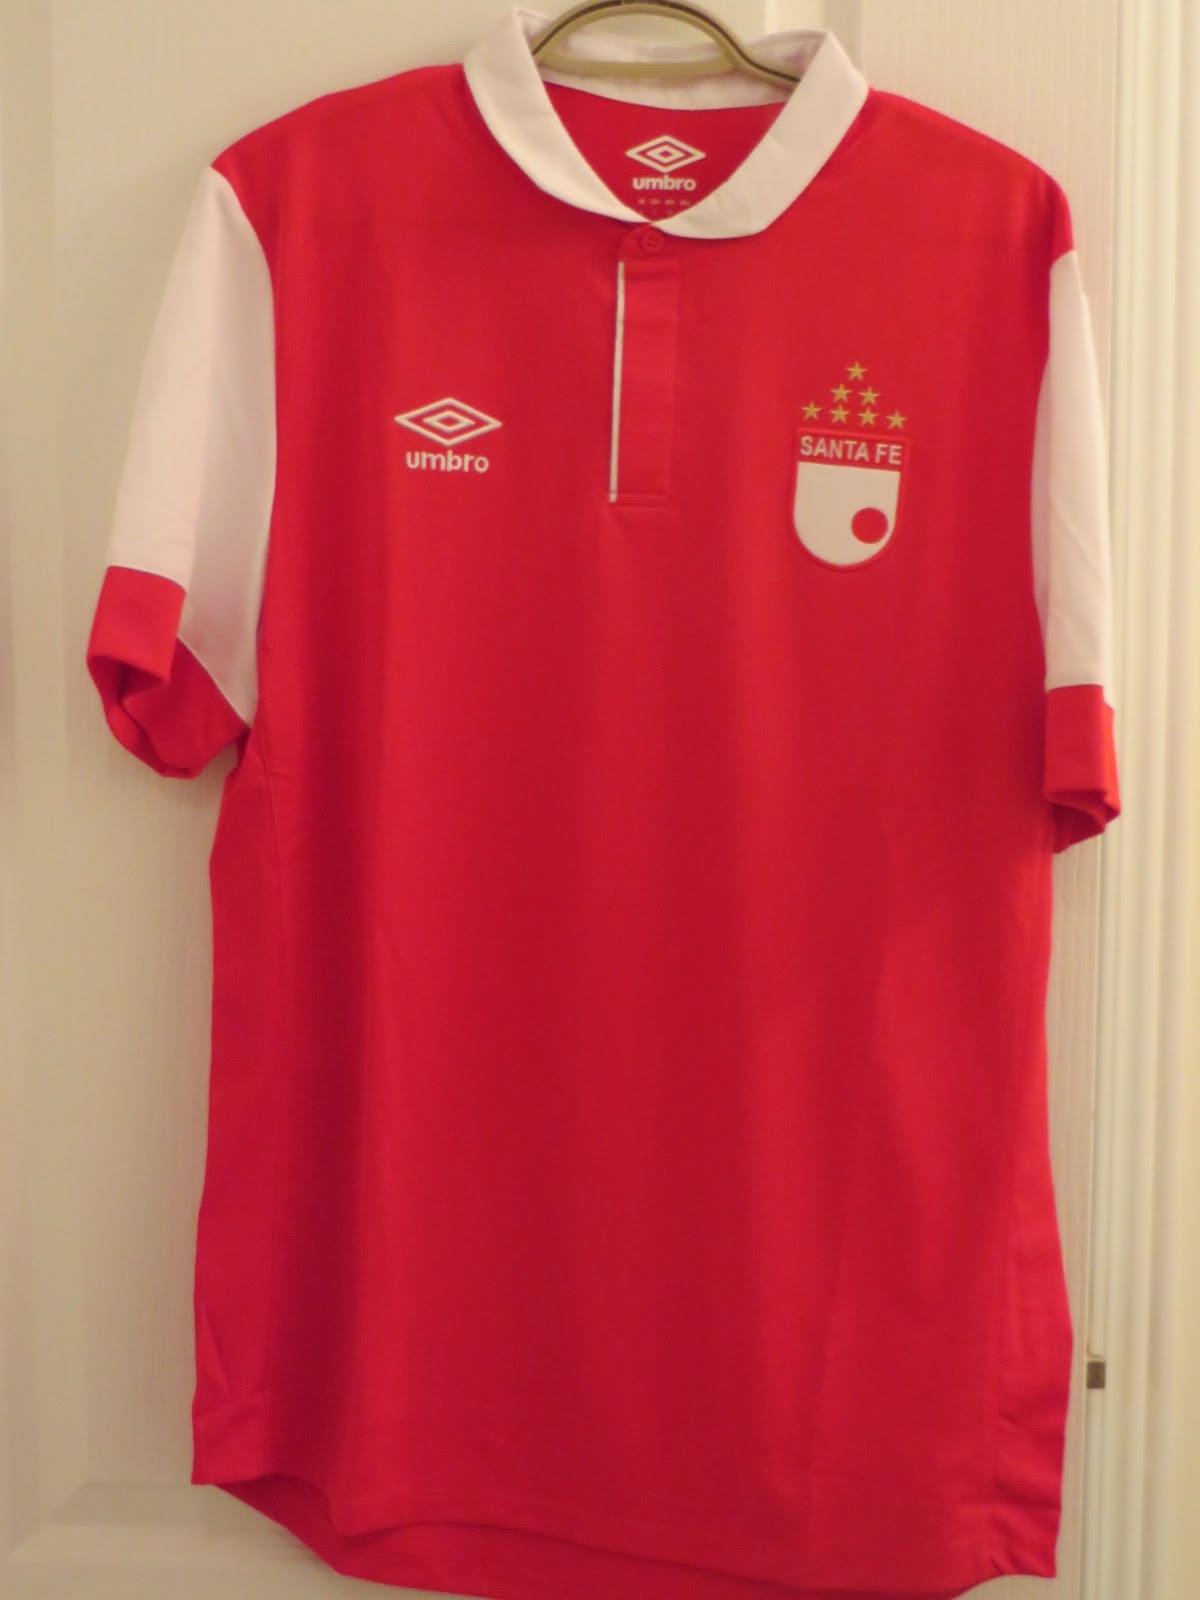 4686c63f1 My Umbro Football Jerseys Collection  Independiente Santa Fe 2014 ...